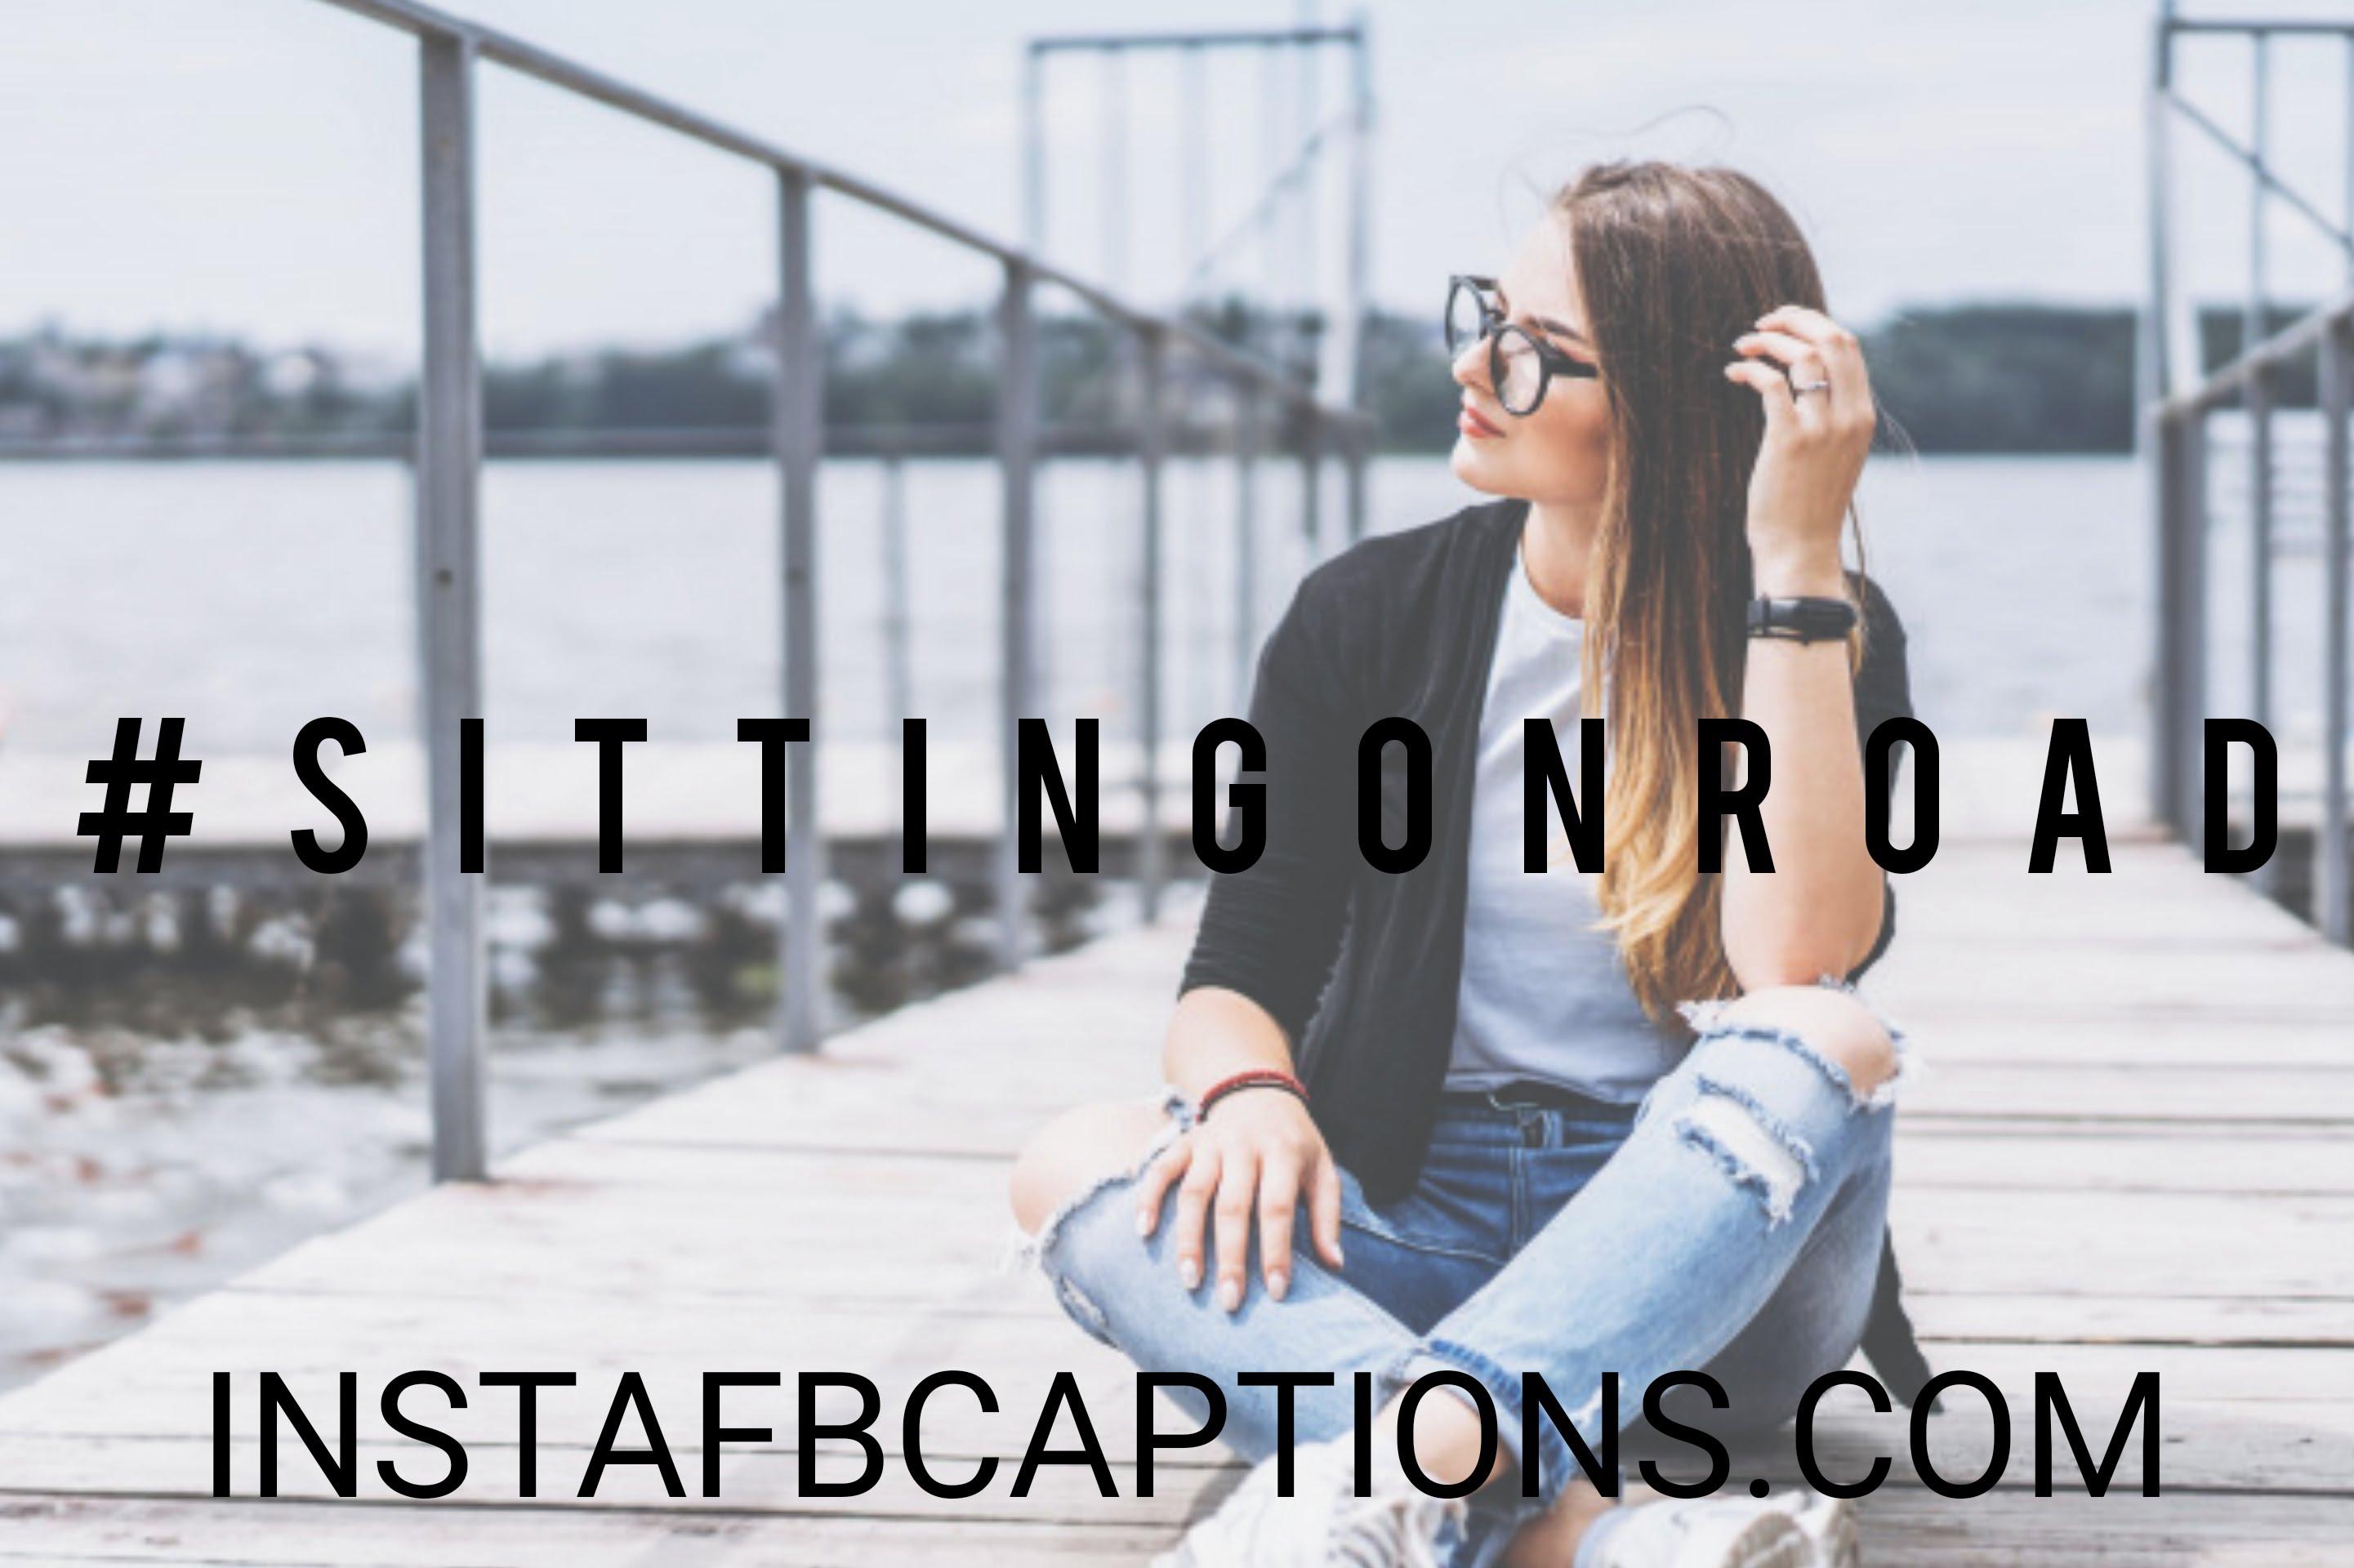 #sittinhgonroad  - sittinhgonroad - Sitting pose captions   (road silence alone love chair)